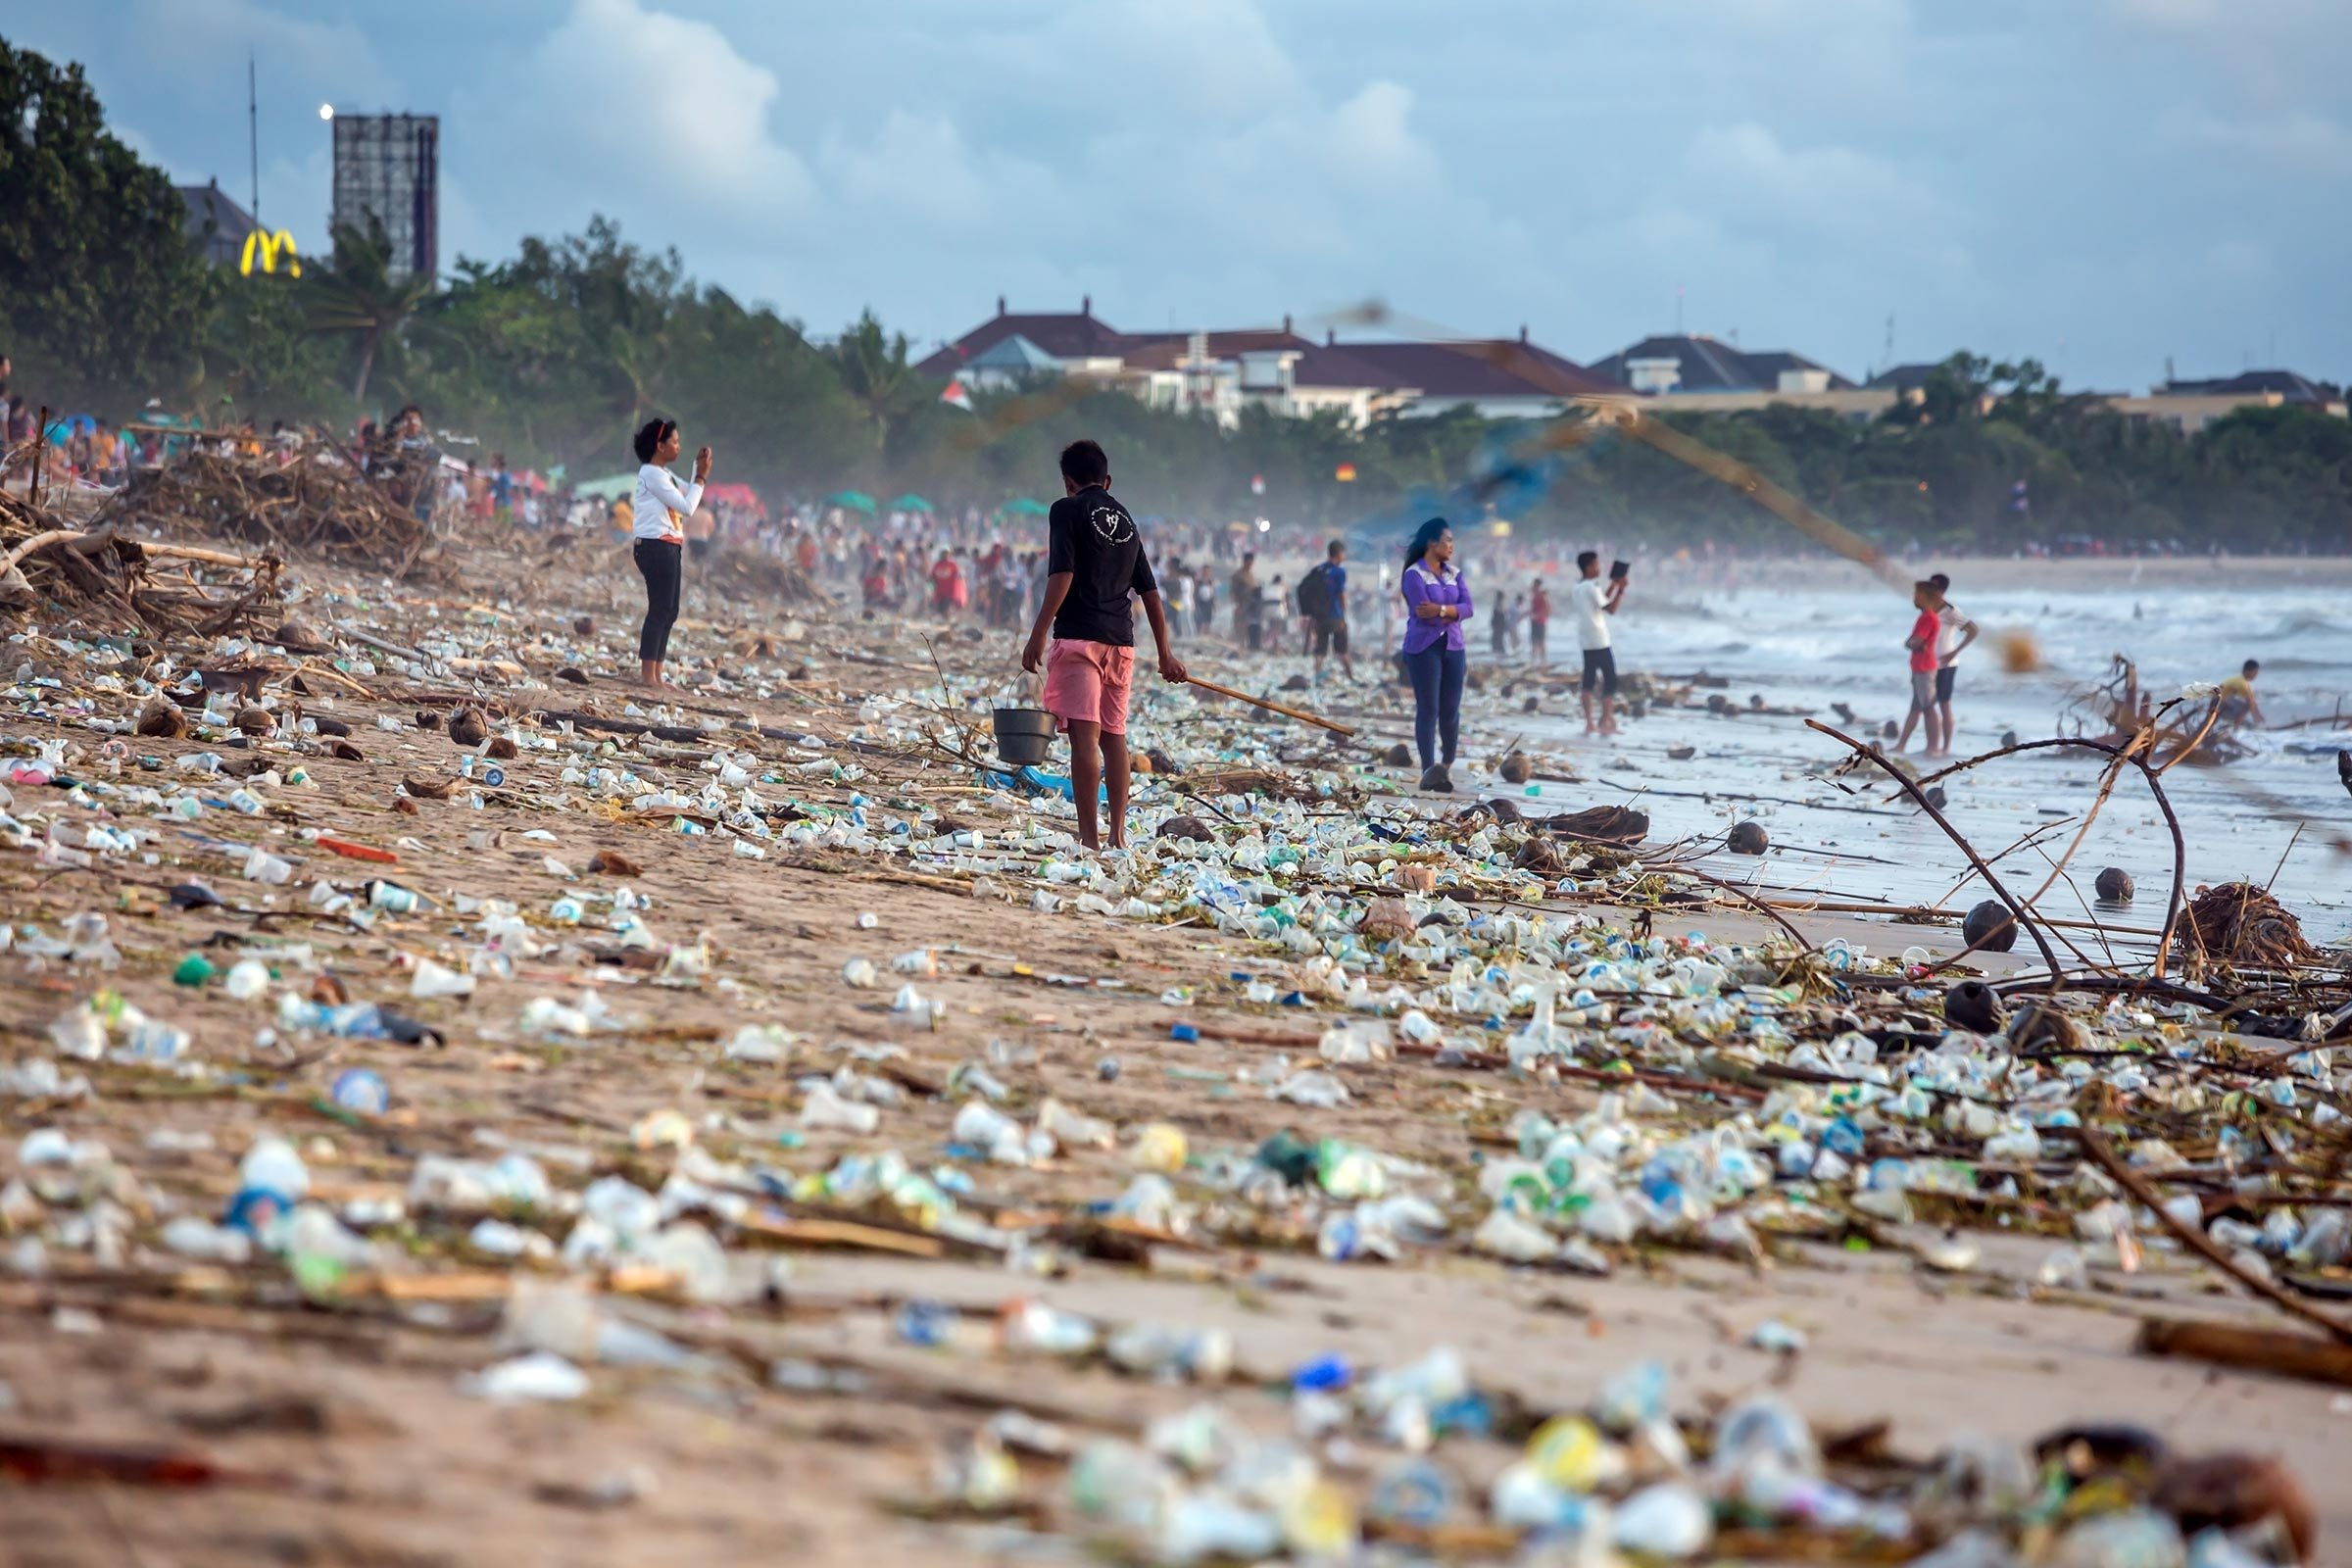 BALI, INDONESIA - FEBRUARY 12, 2017: Beach pollution at Kuta beach, Bali. Many garbage on the beach